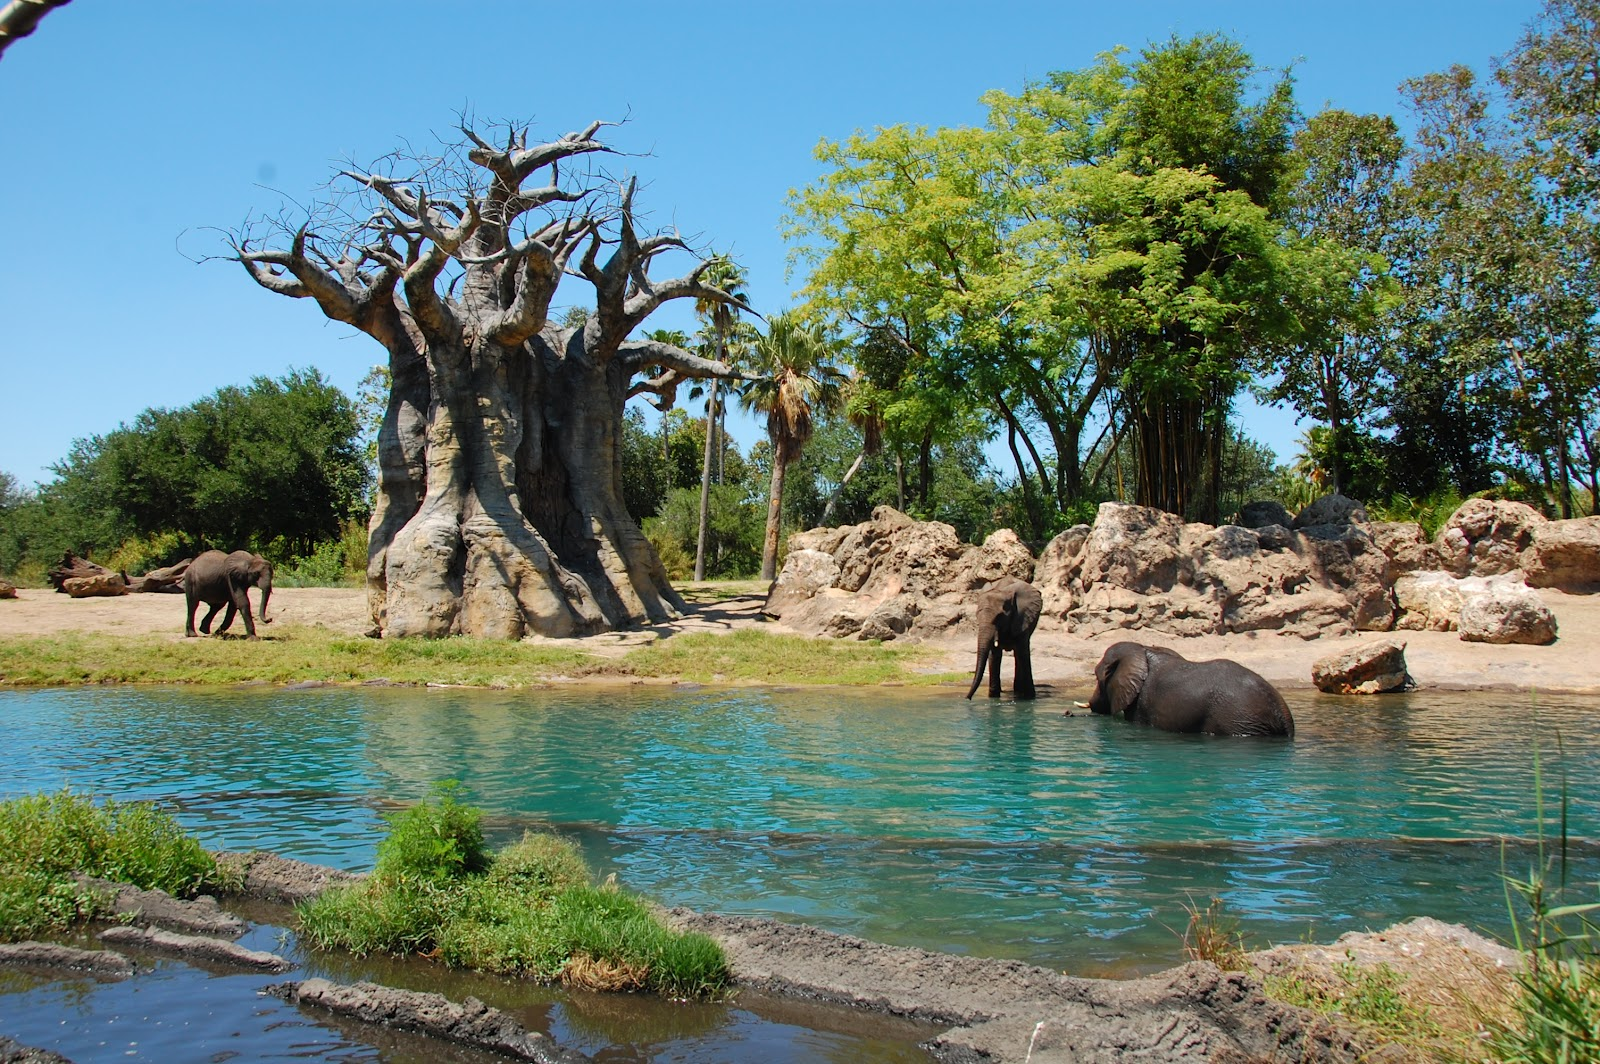 Image of: Walt Disney Elephants Taking Bath On Kilimanjaro Safari At Animal Kingdom Disney Sisters Disney Sisters Elephants Taking Bath On Kilimanjaro Safari At